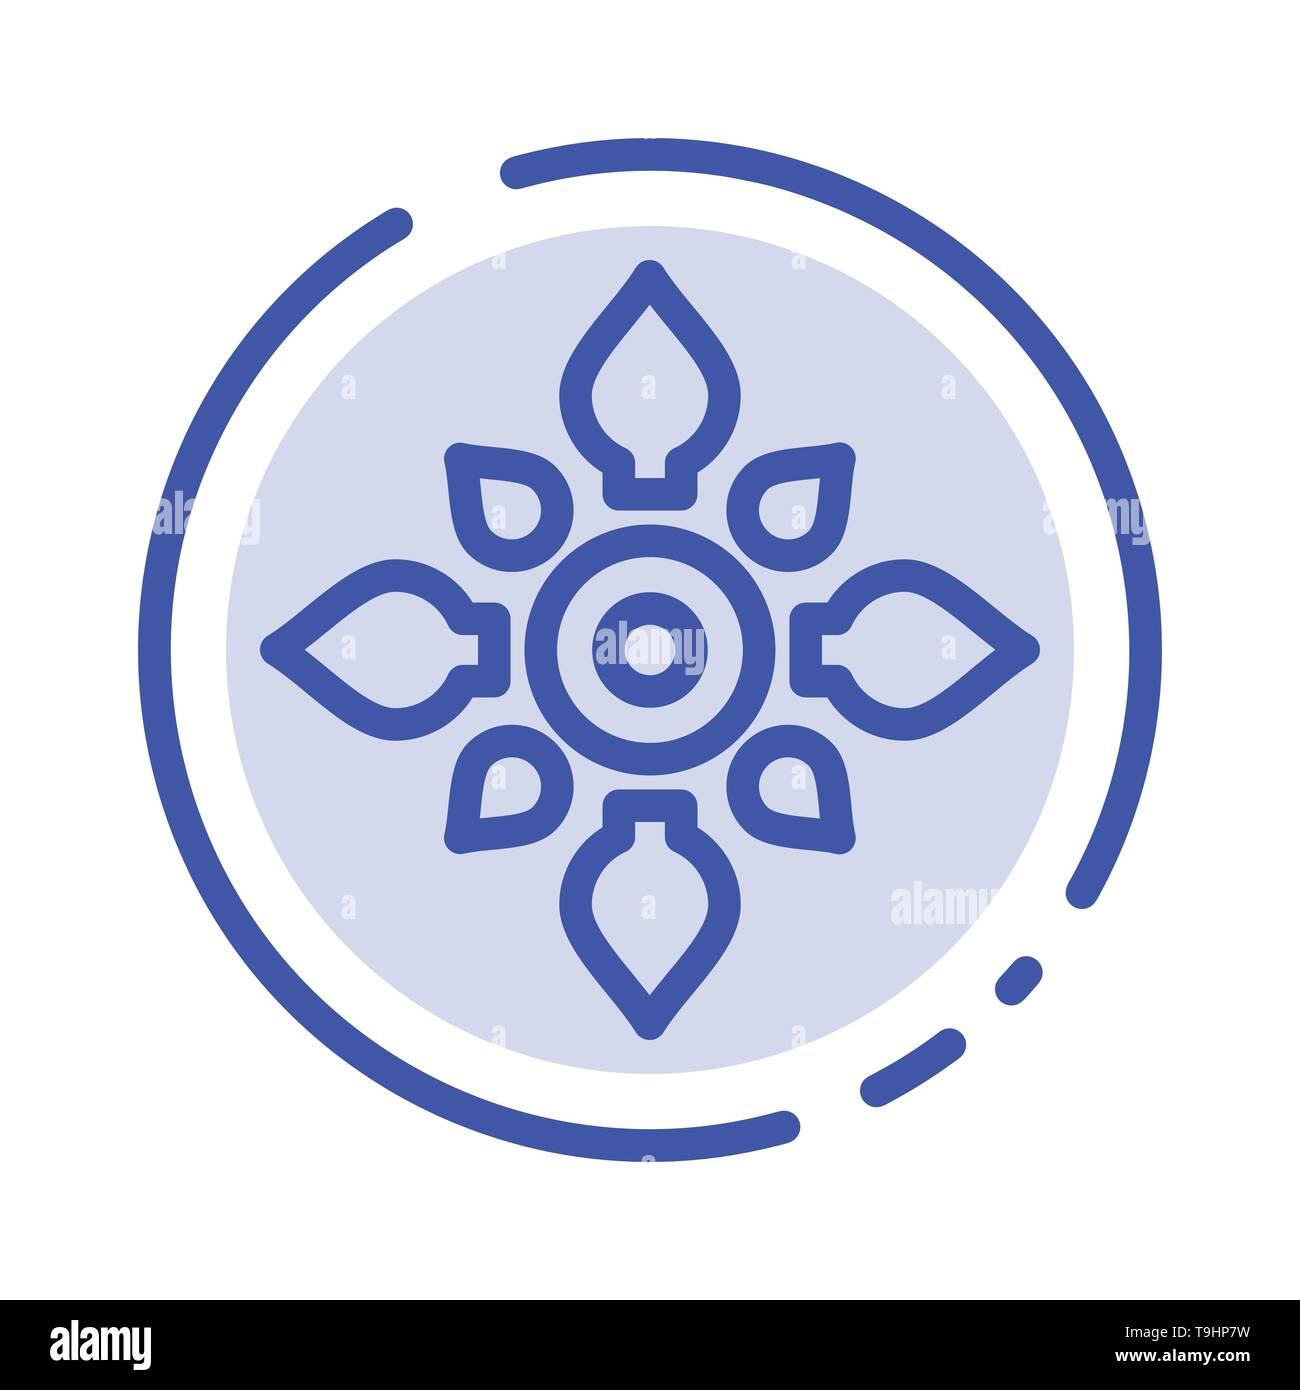 Celebrate, Decorate, Decoration, Diwali, Hindu, Holi Blue Dotted Line Line Icon - Stock Image